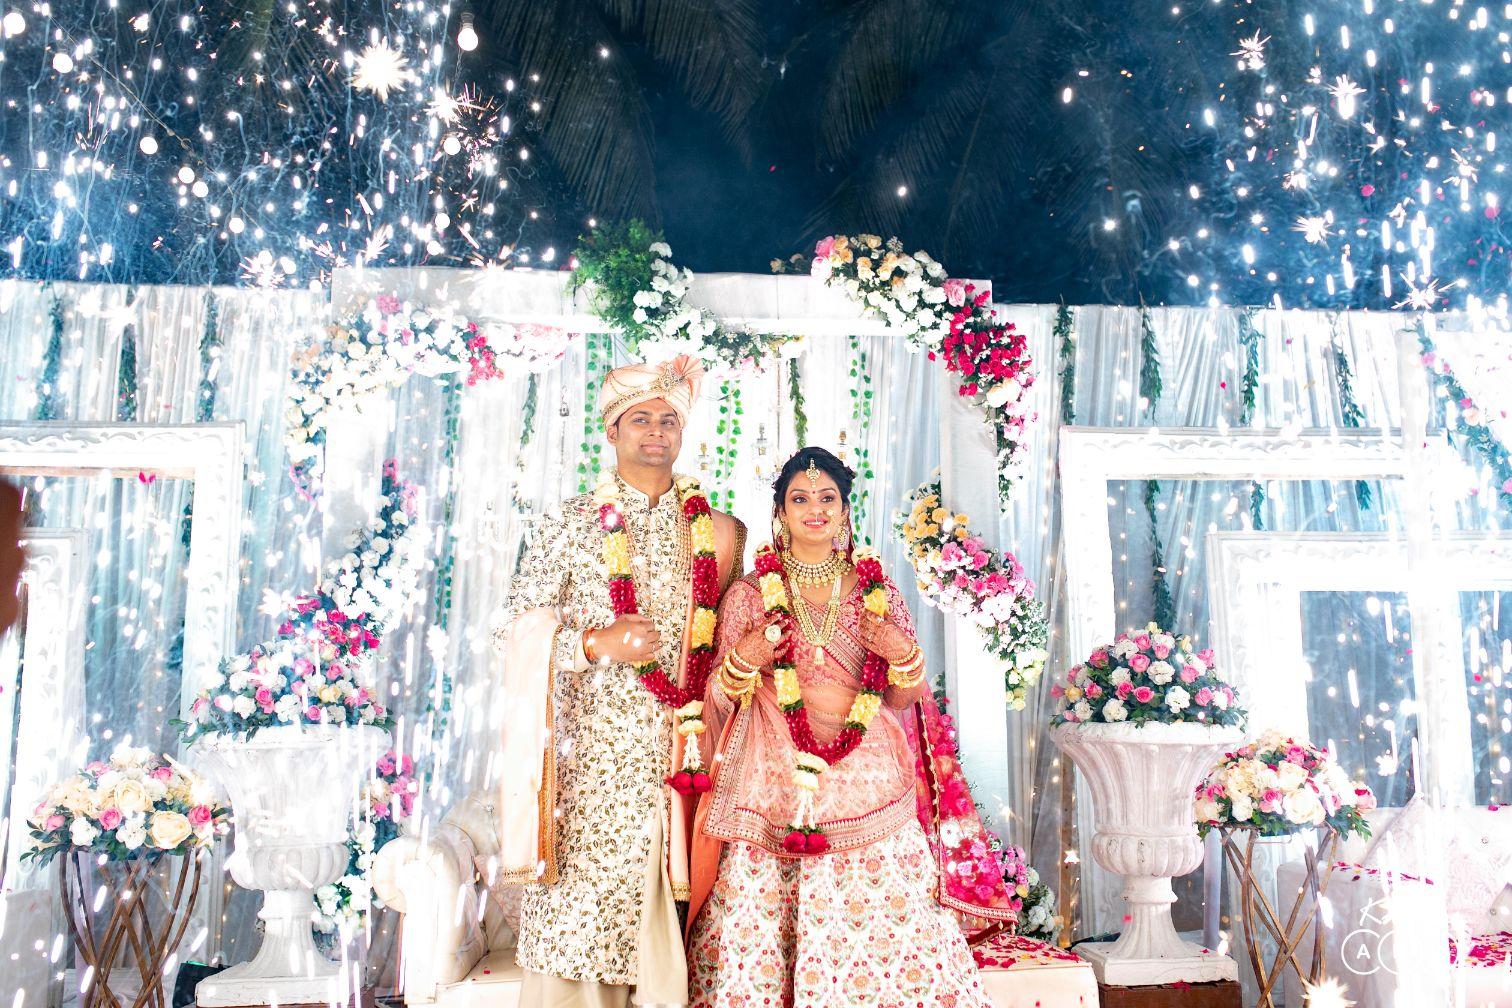 Bride & Groom Varmala Ceremony and White Frames & Colorful Flowers Decor